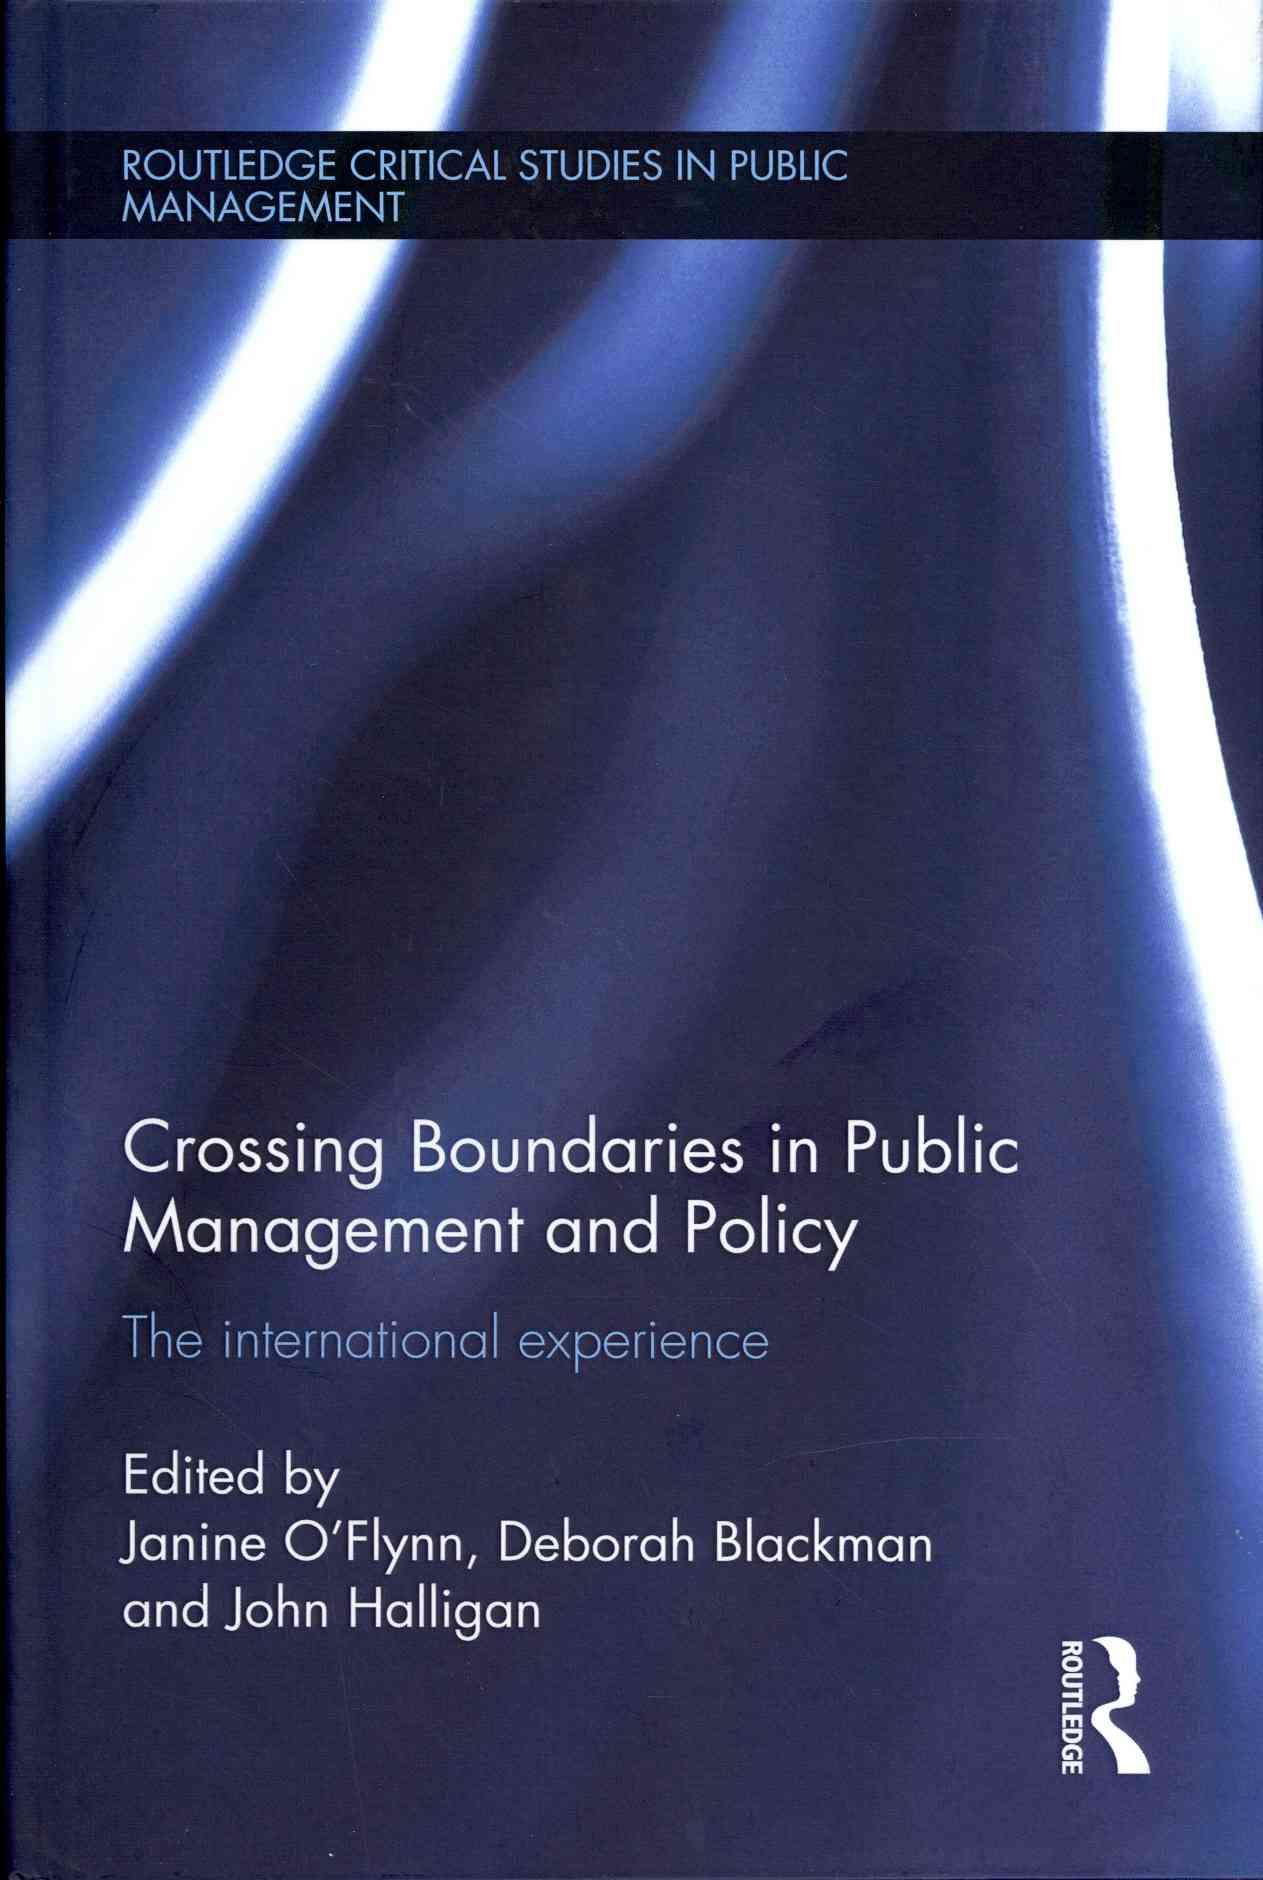 Crossing Boundaries in Public Management and Policy By O'flynn, Janine (EDT)/ Blackman, Deborah (EDT)/ Halligan, John (EDT)